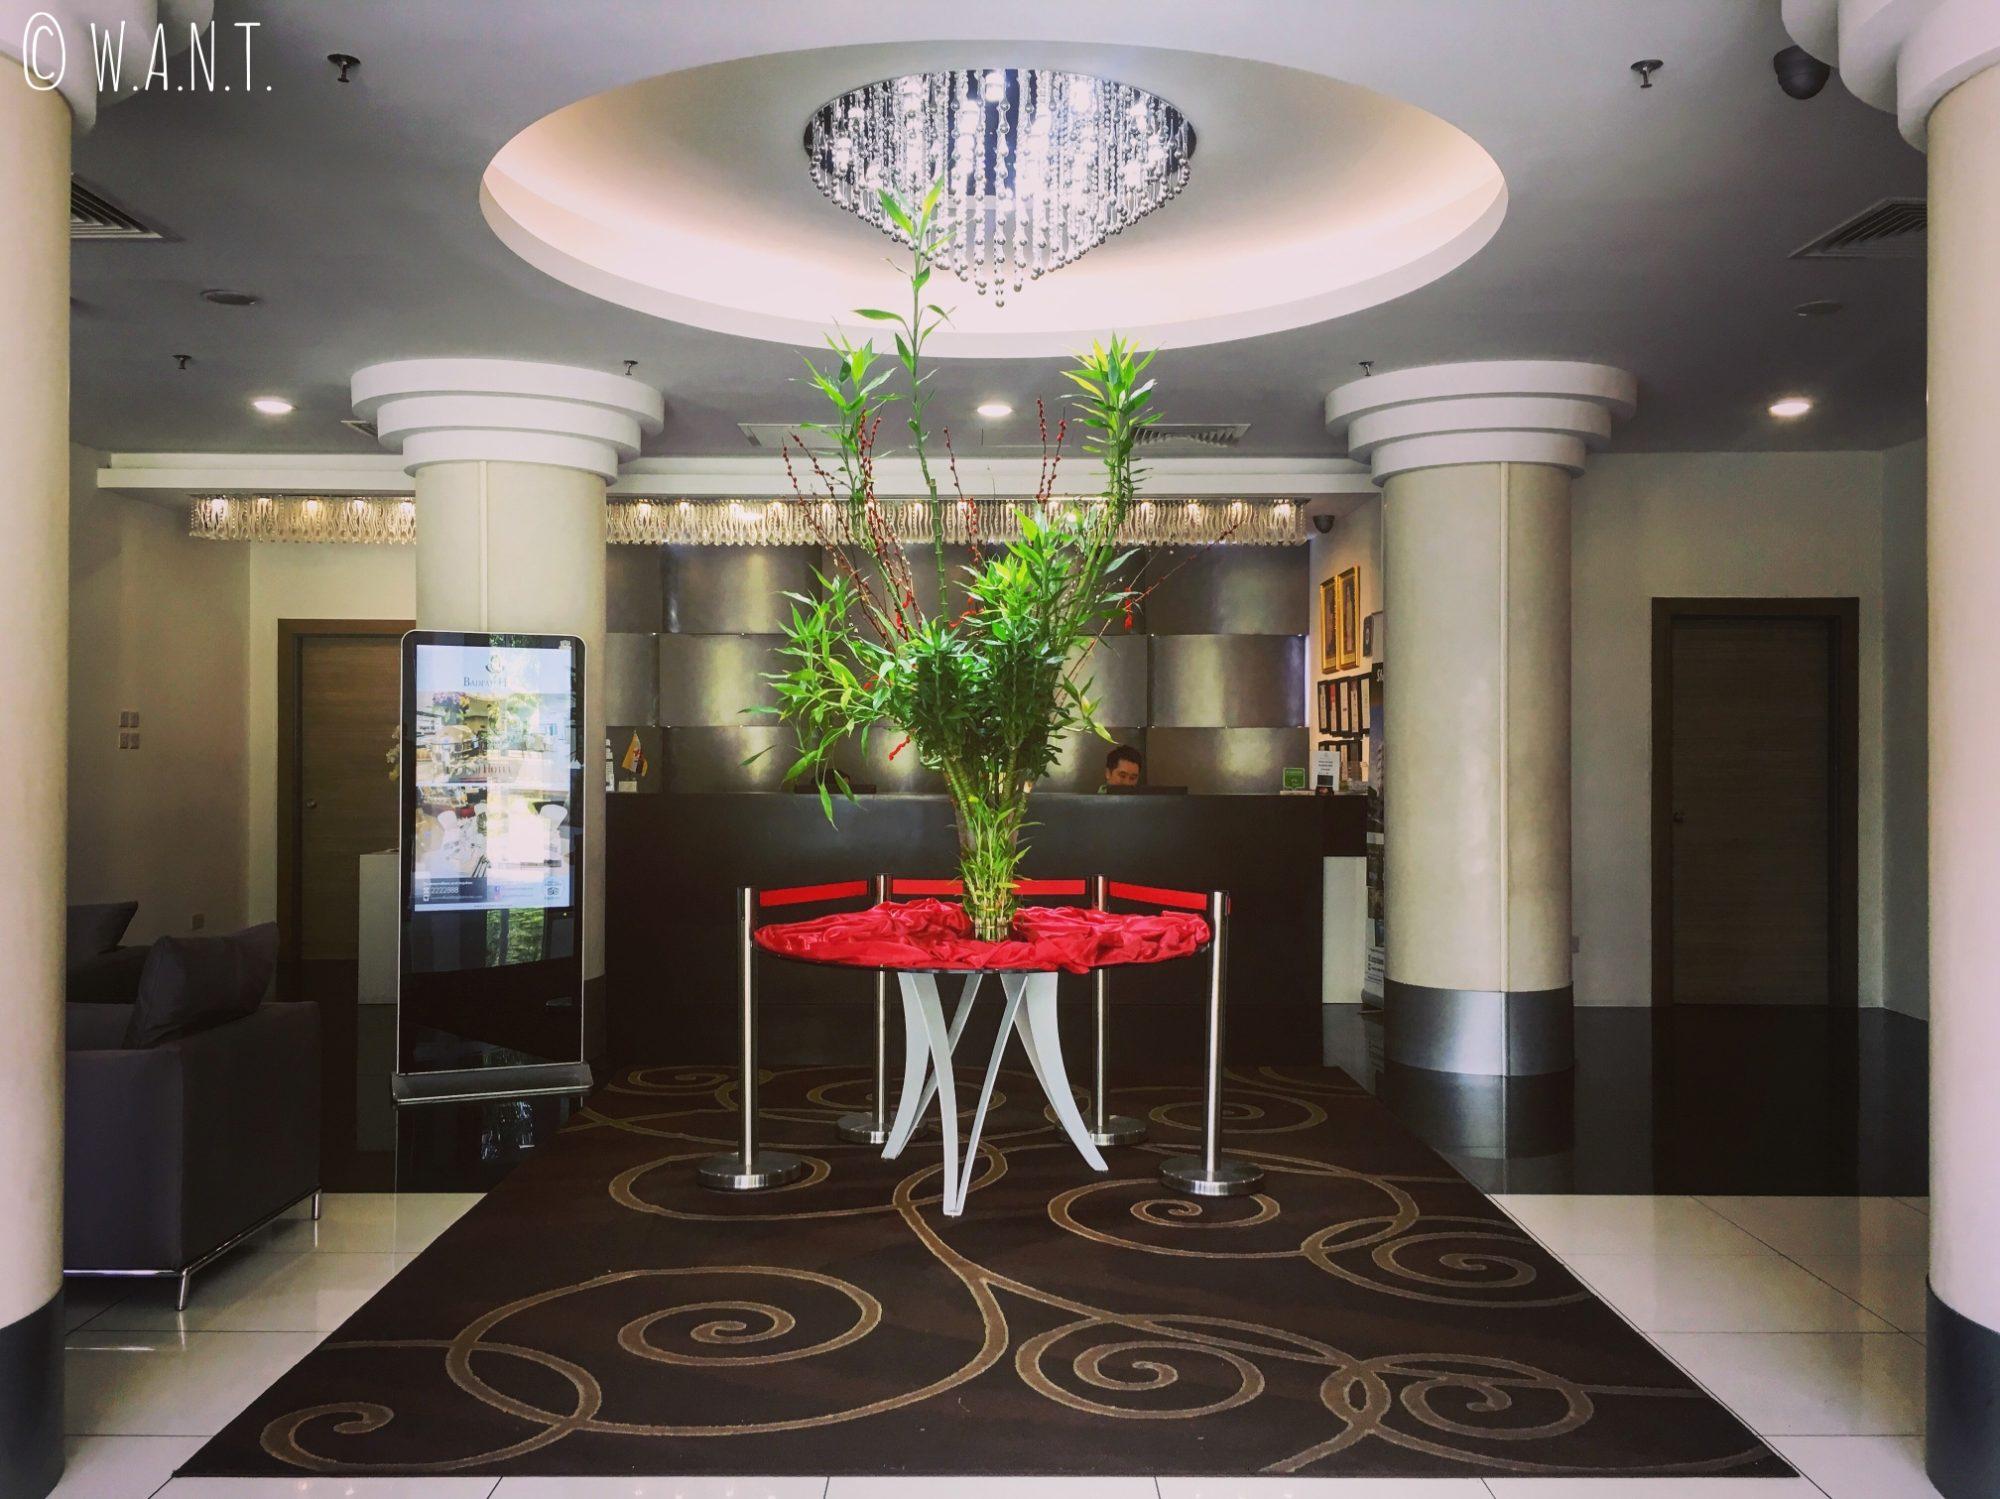 Hall d'entrée du Badi'ah Hotel de Bandar Seri Begawan